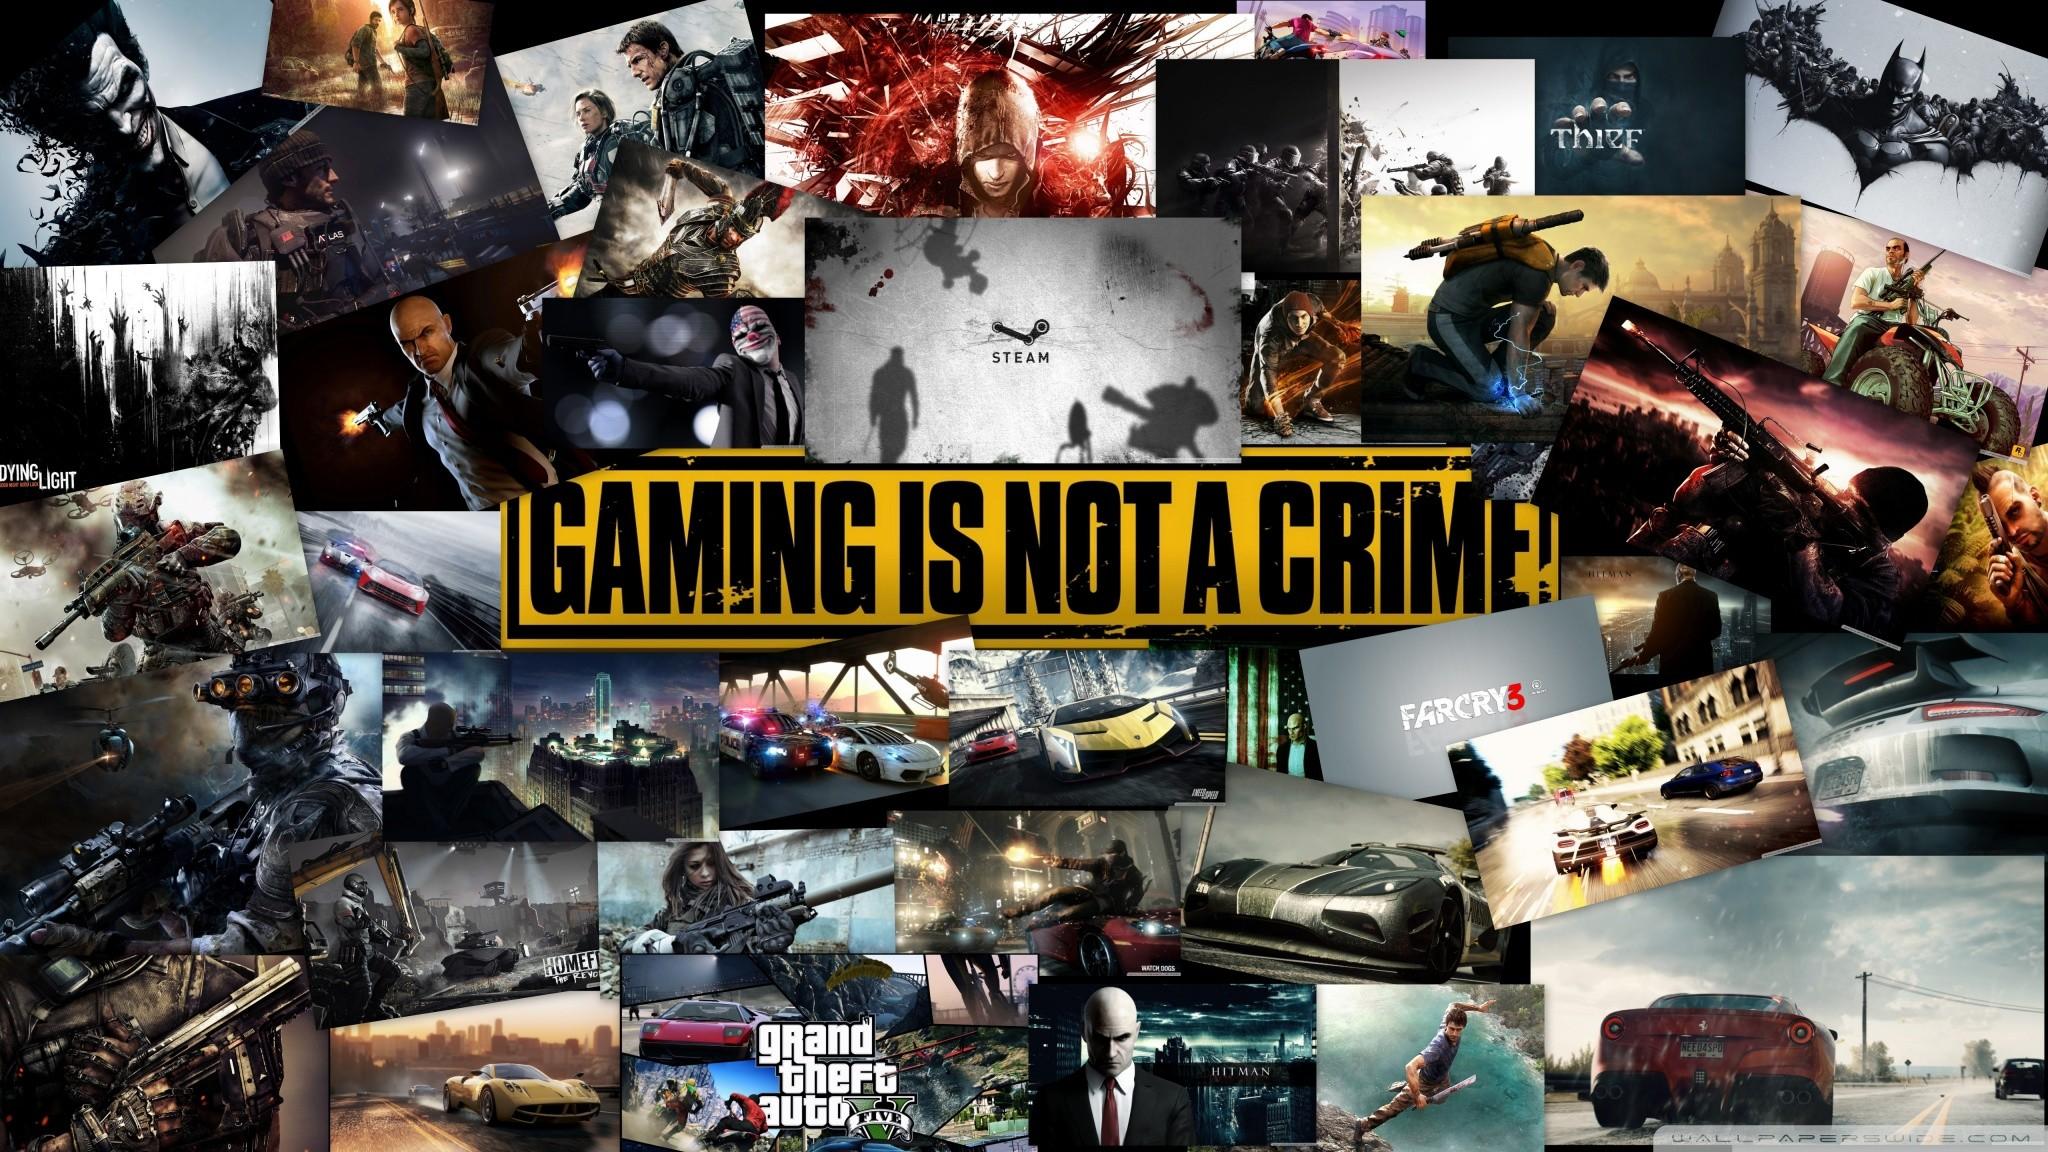 2048x1152 Gaming Wallpaper 90 Images